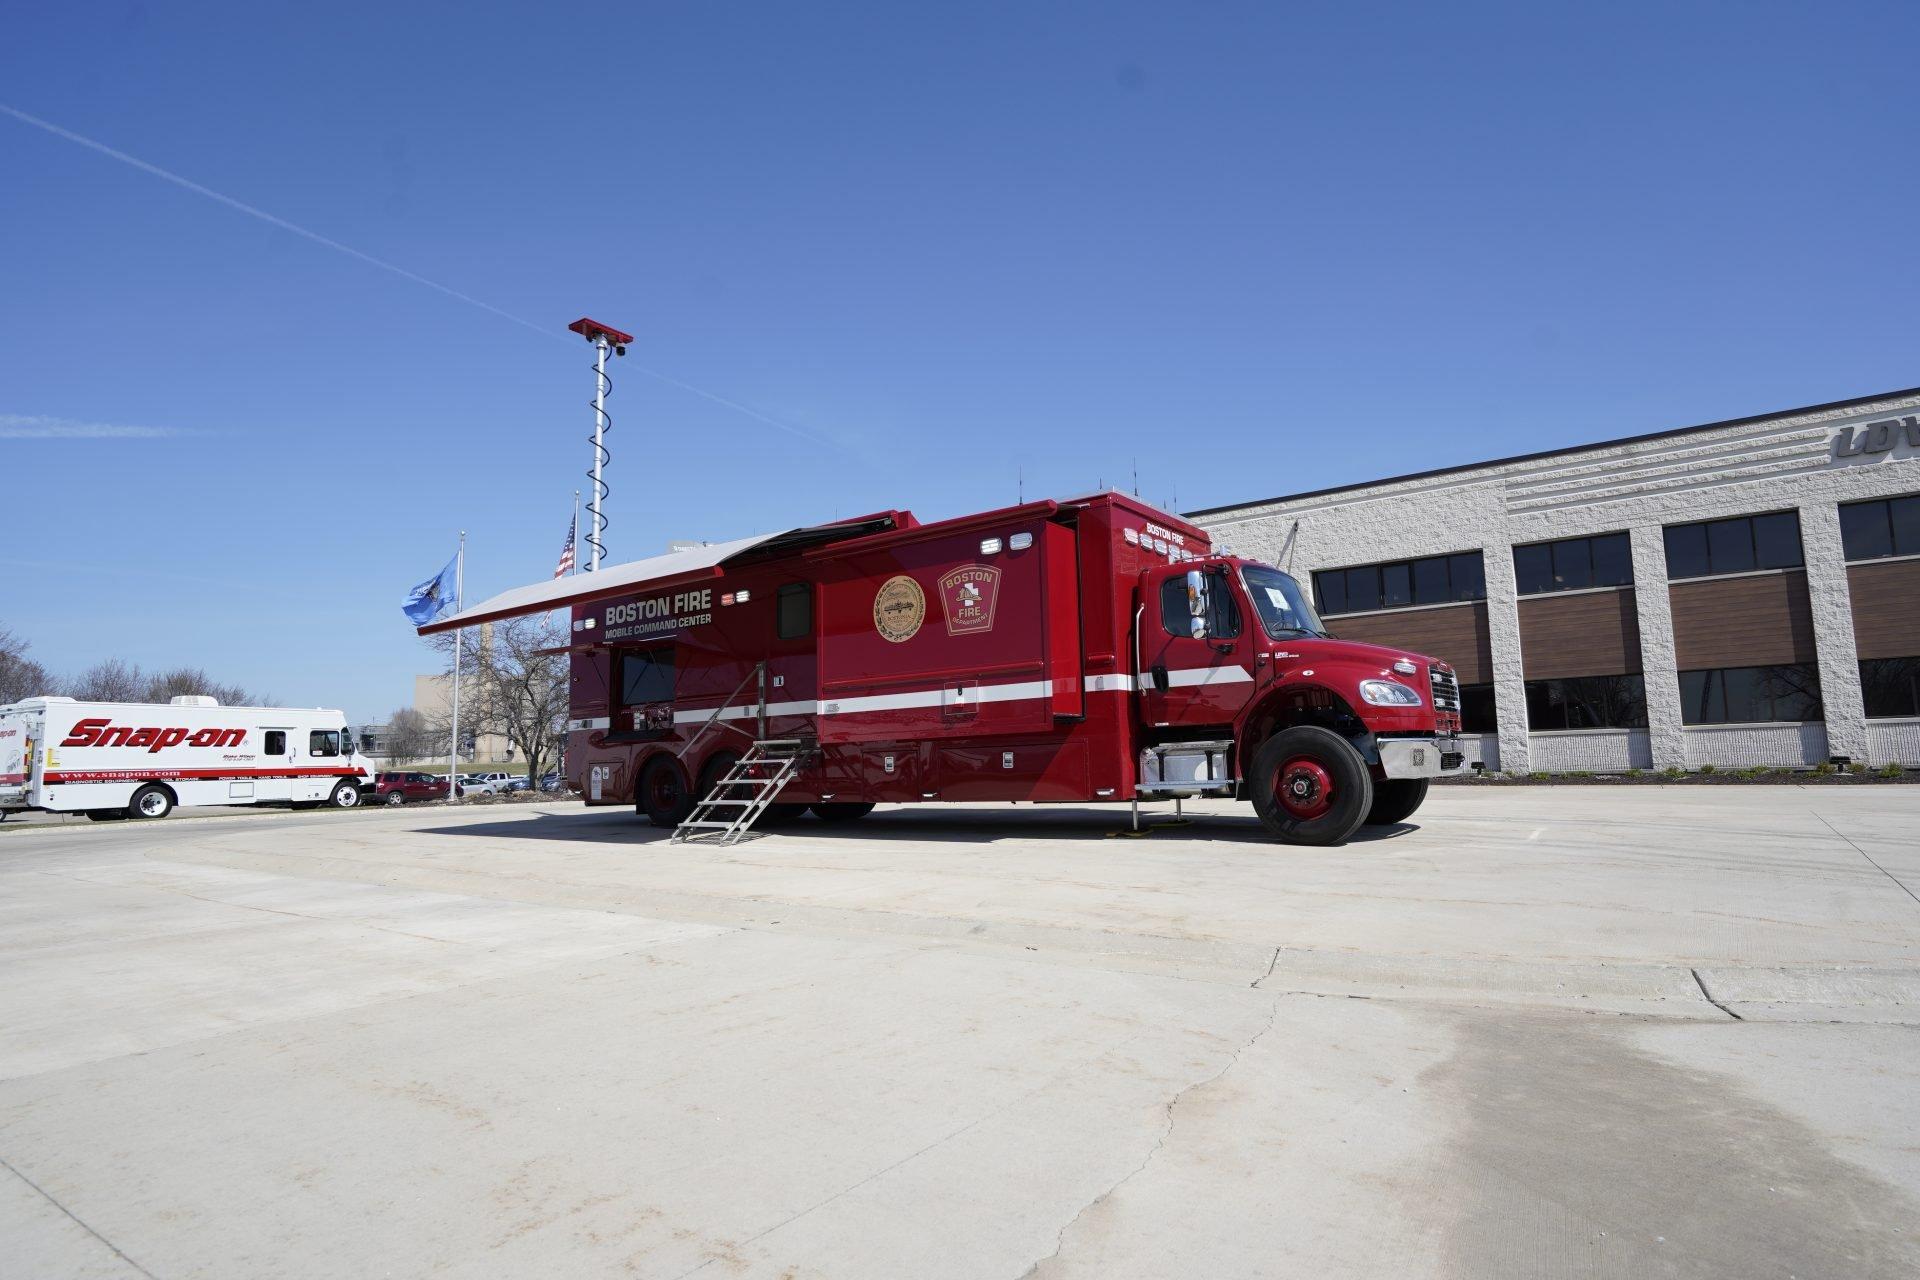 LDV-Boston Fire Department Mobile Command Center